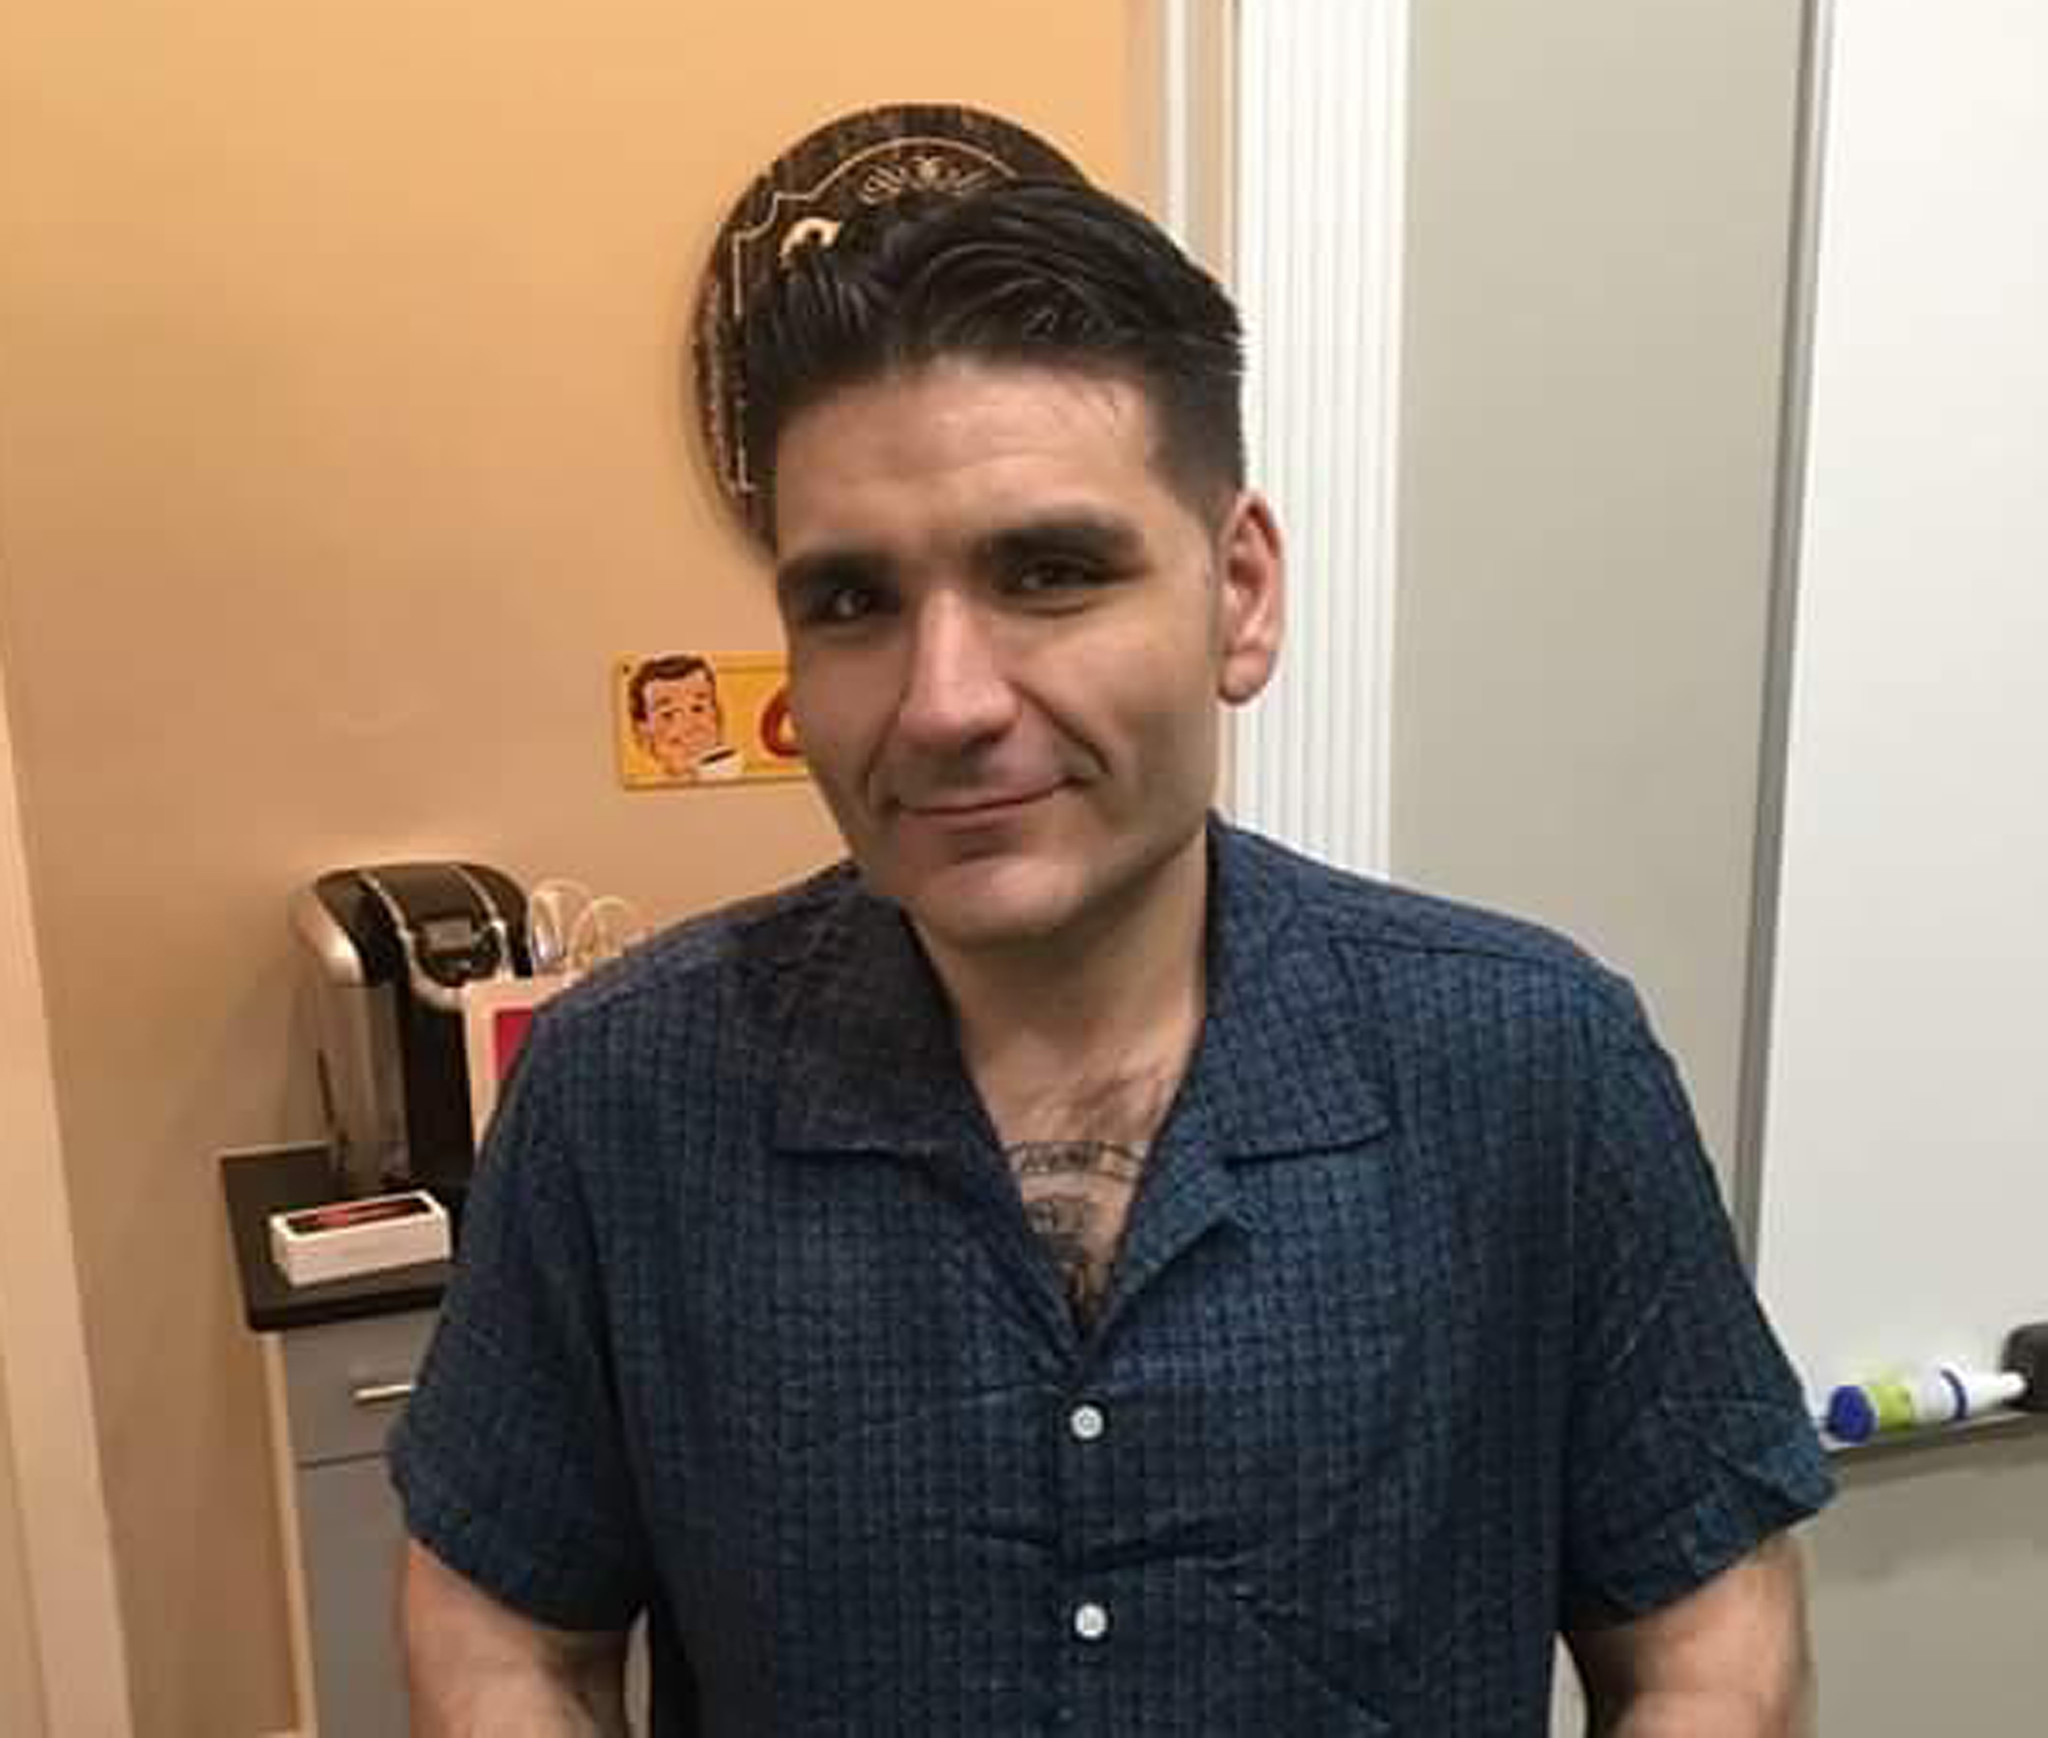 Homeless man says NYC hospital sent him back to shelter with coronavirus symptoms